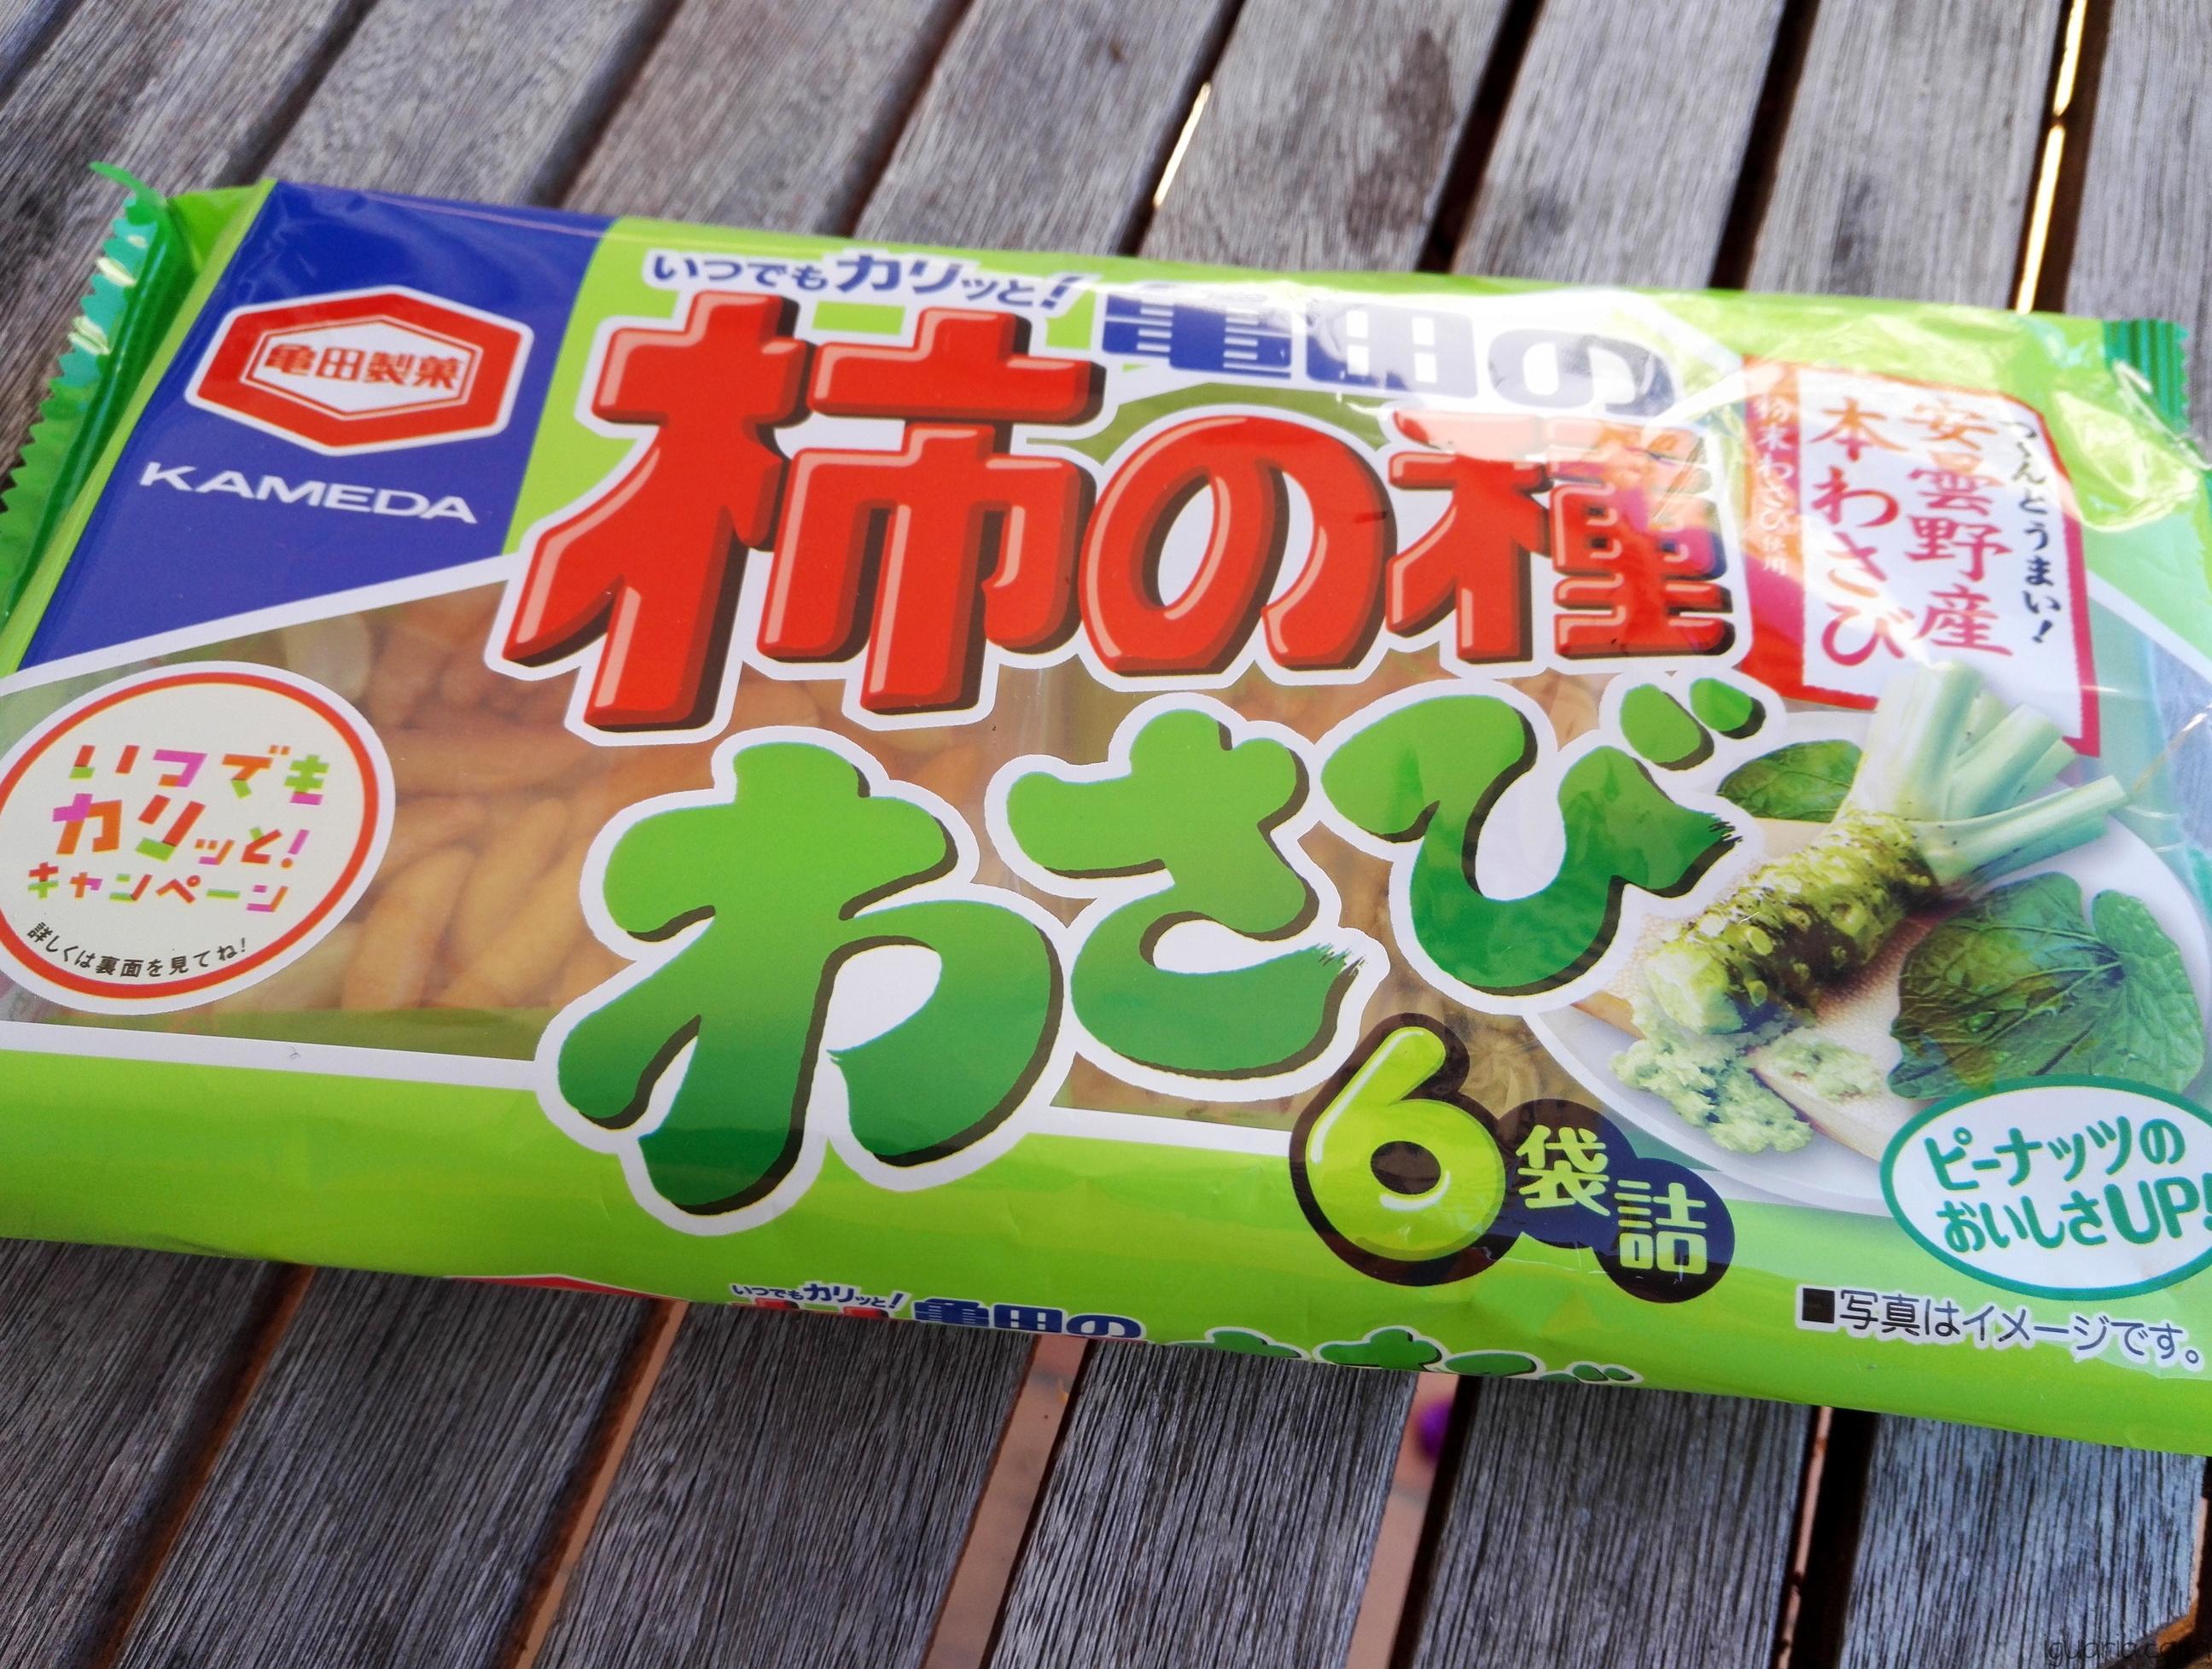 Iguaria_Wasabi-Khaki-no-Tane-Rice-Crackers-Peanuts